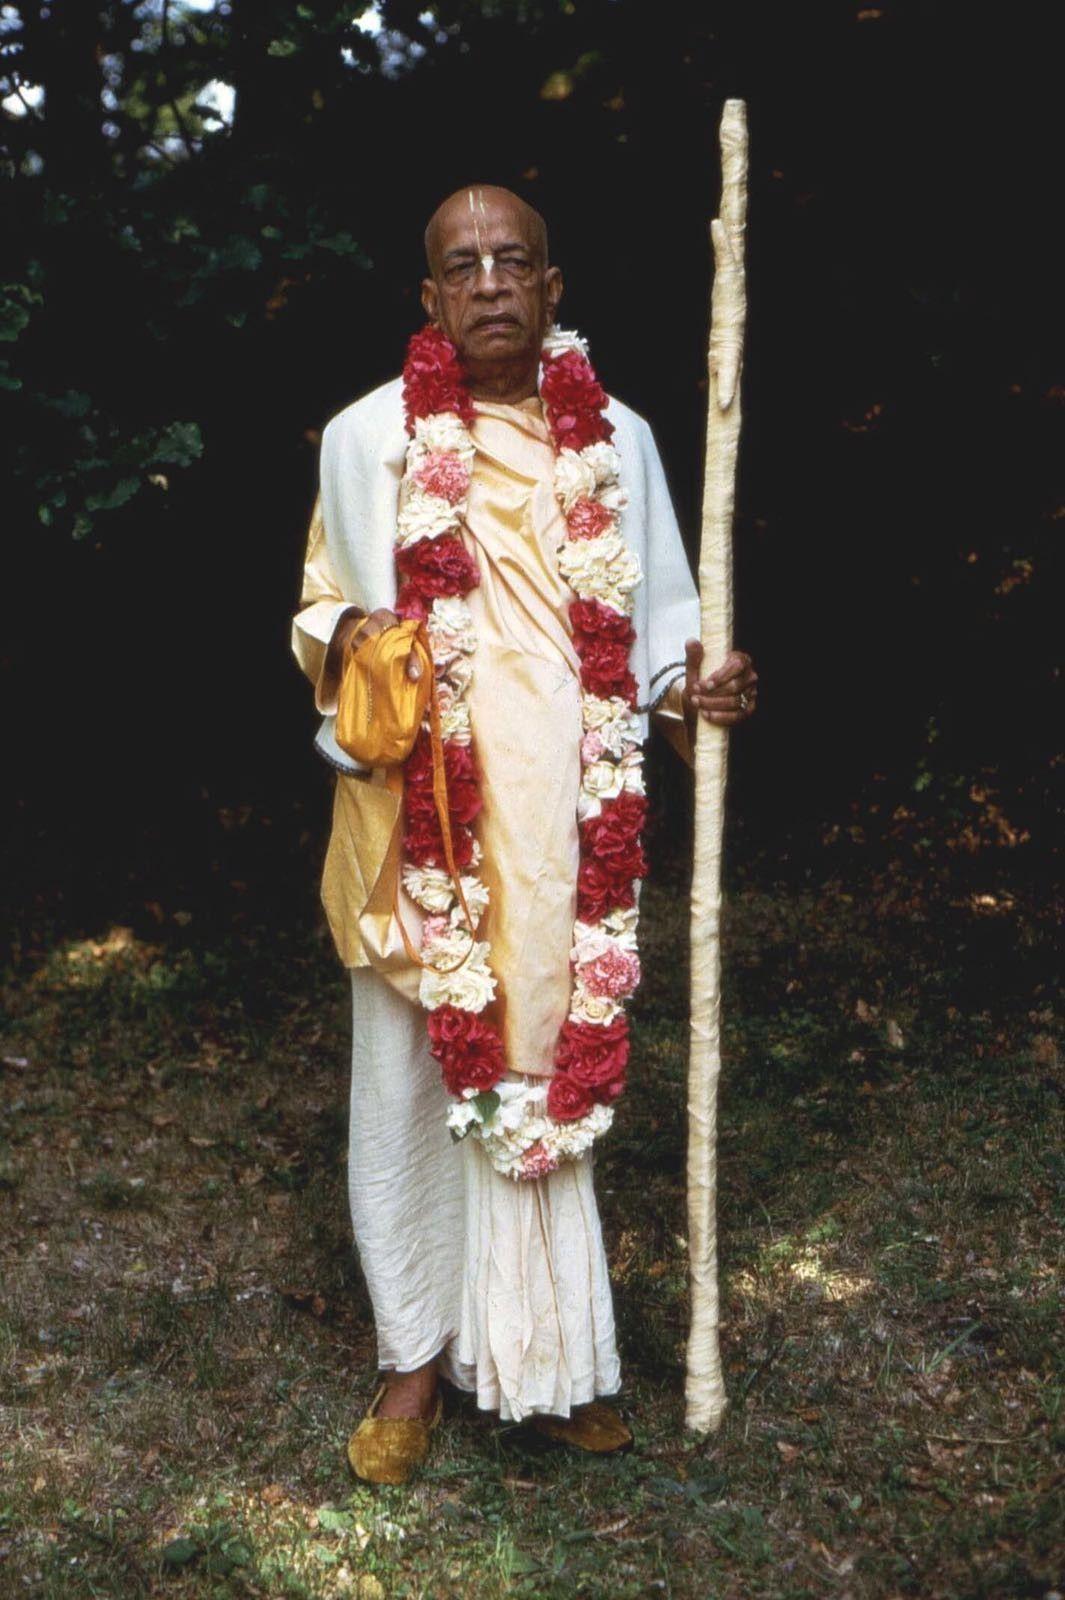 Pin Di Radhika Dasi Su His Divine Grace A C Bhaktivedanta Swami Prabhupada